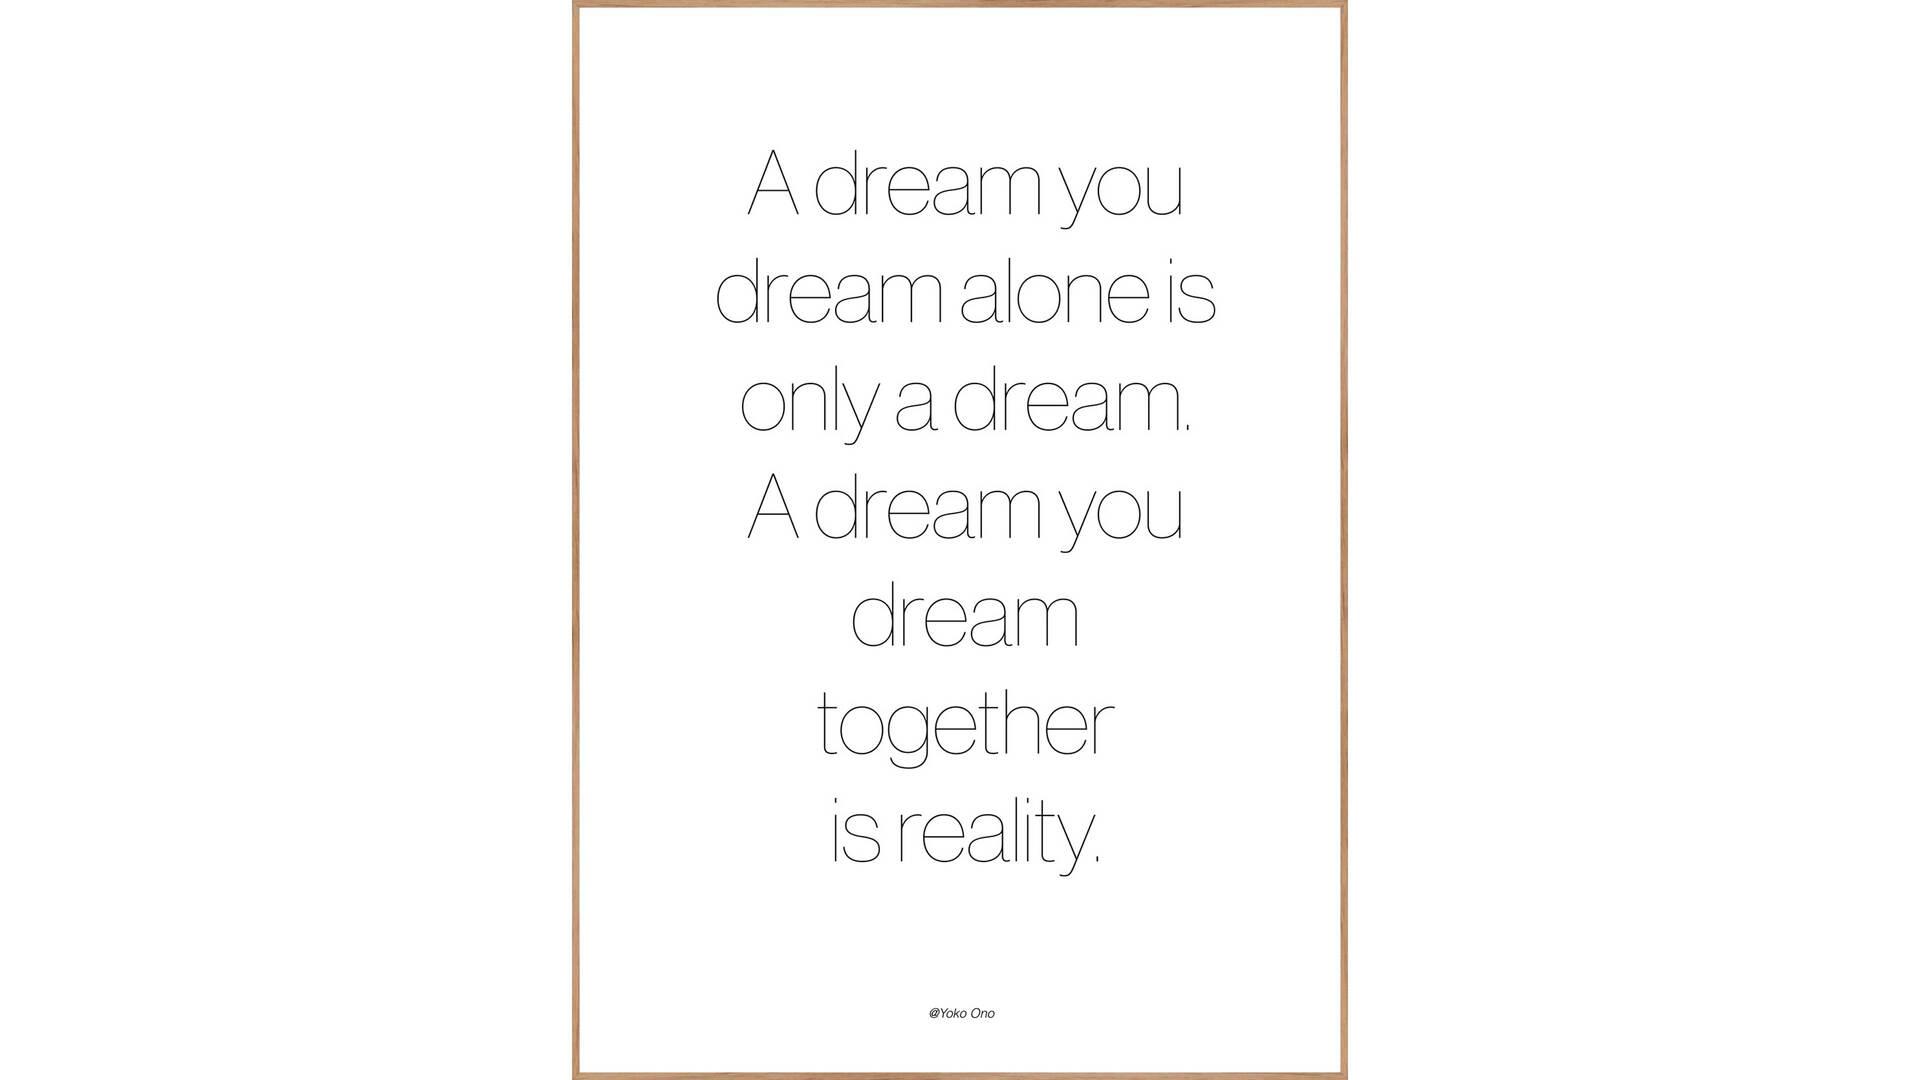 Interliving BEST BUDDYS! Posterdruck A Dream